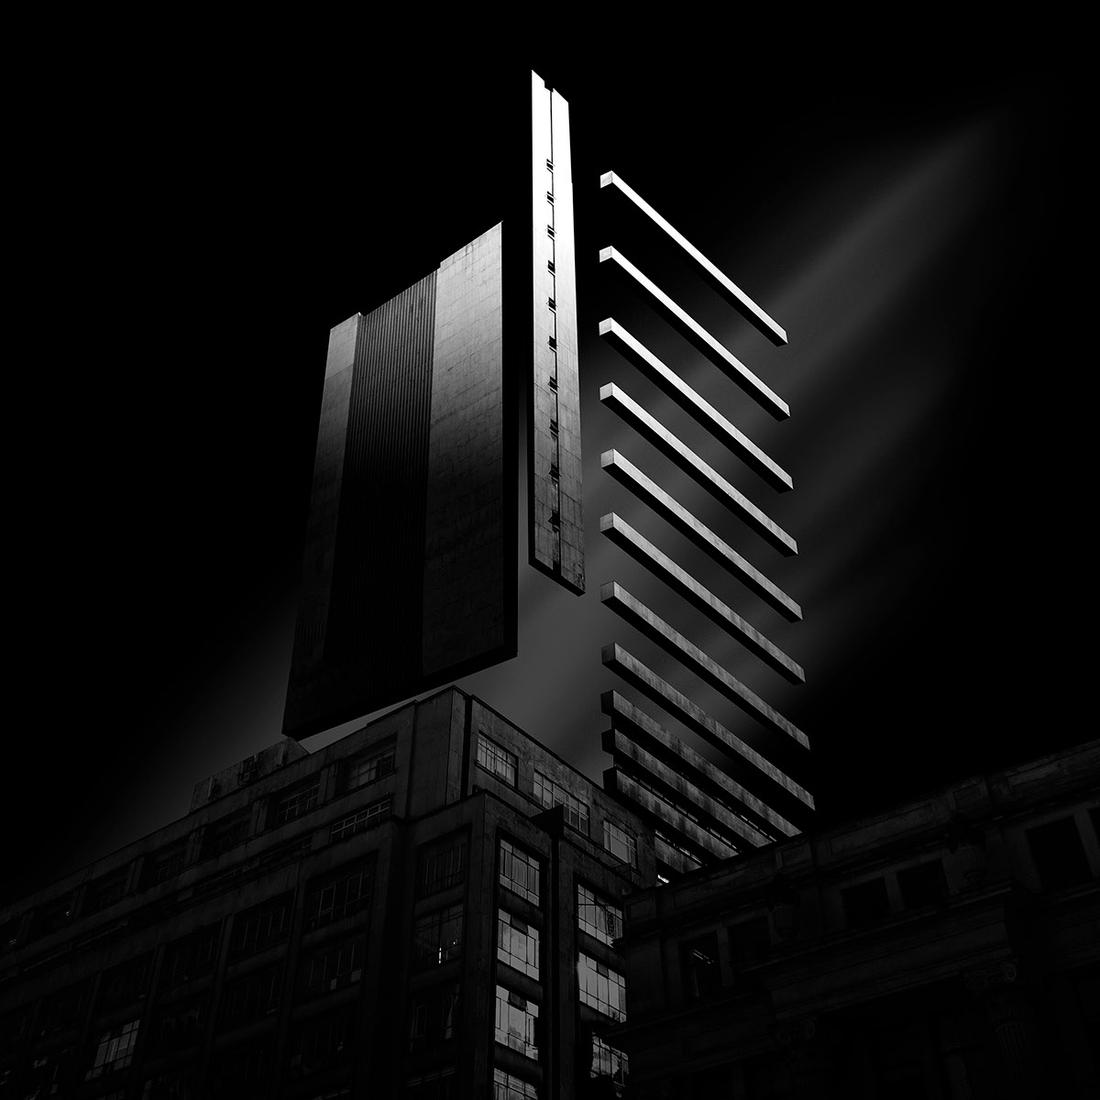 03-Daniel-Garay-Arango-Black-and-White-Surreal-Photographs-Architectural-Deconstruction-www-designstack-co